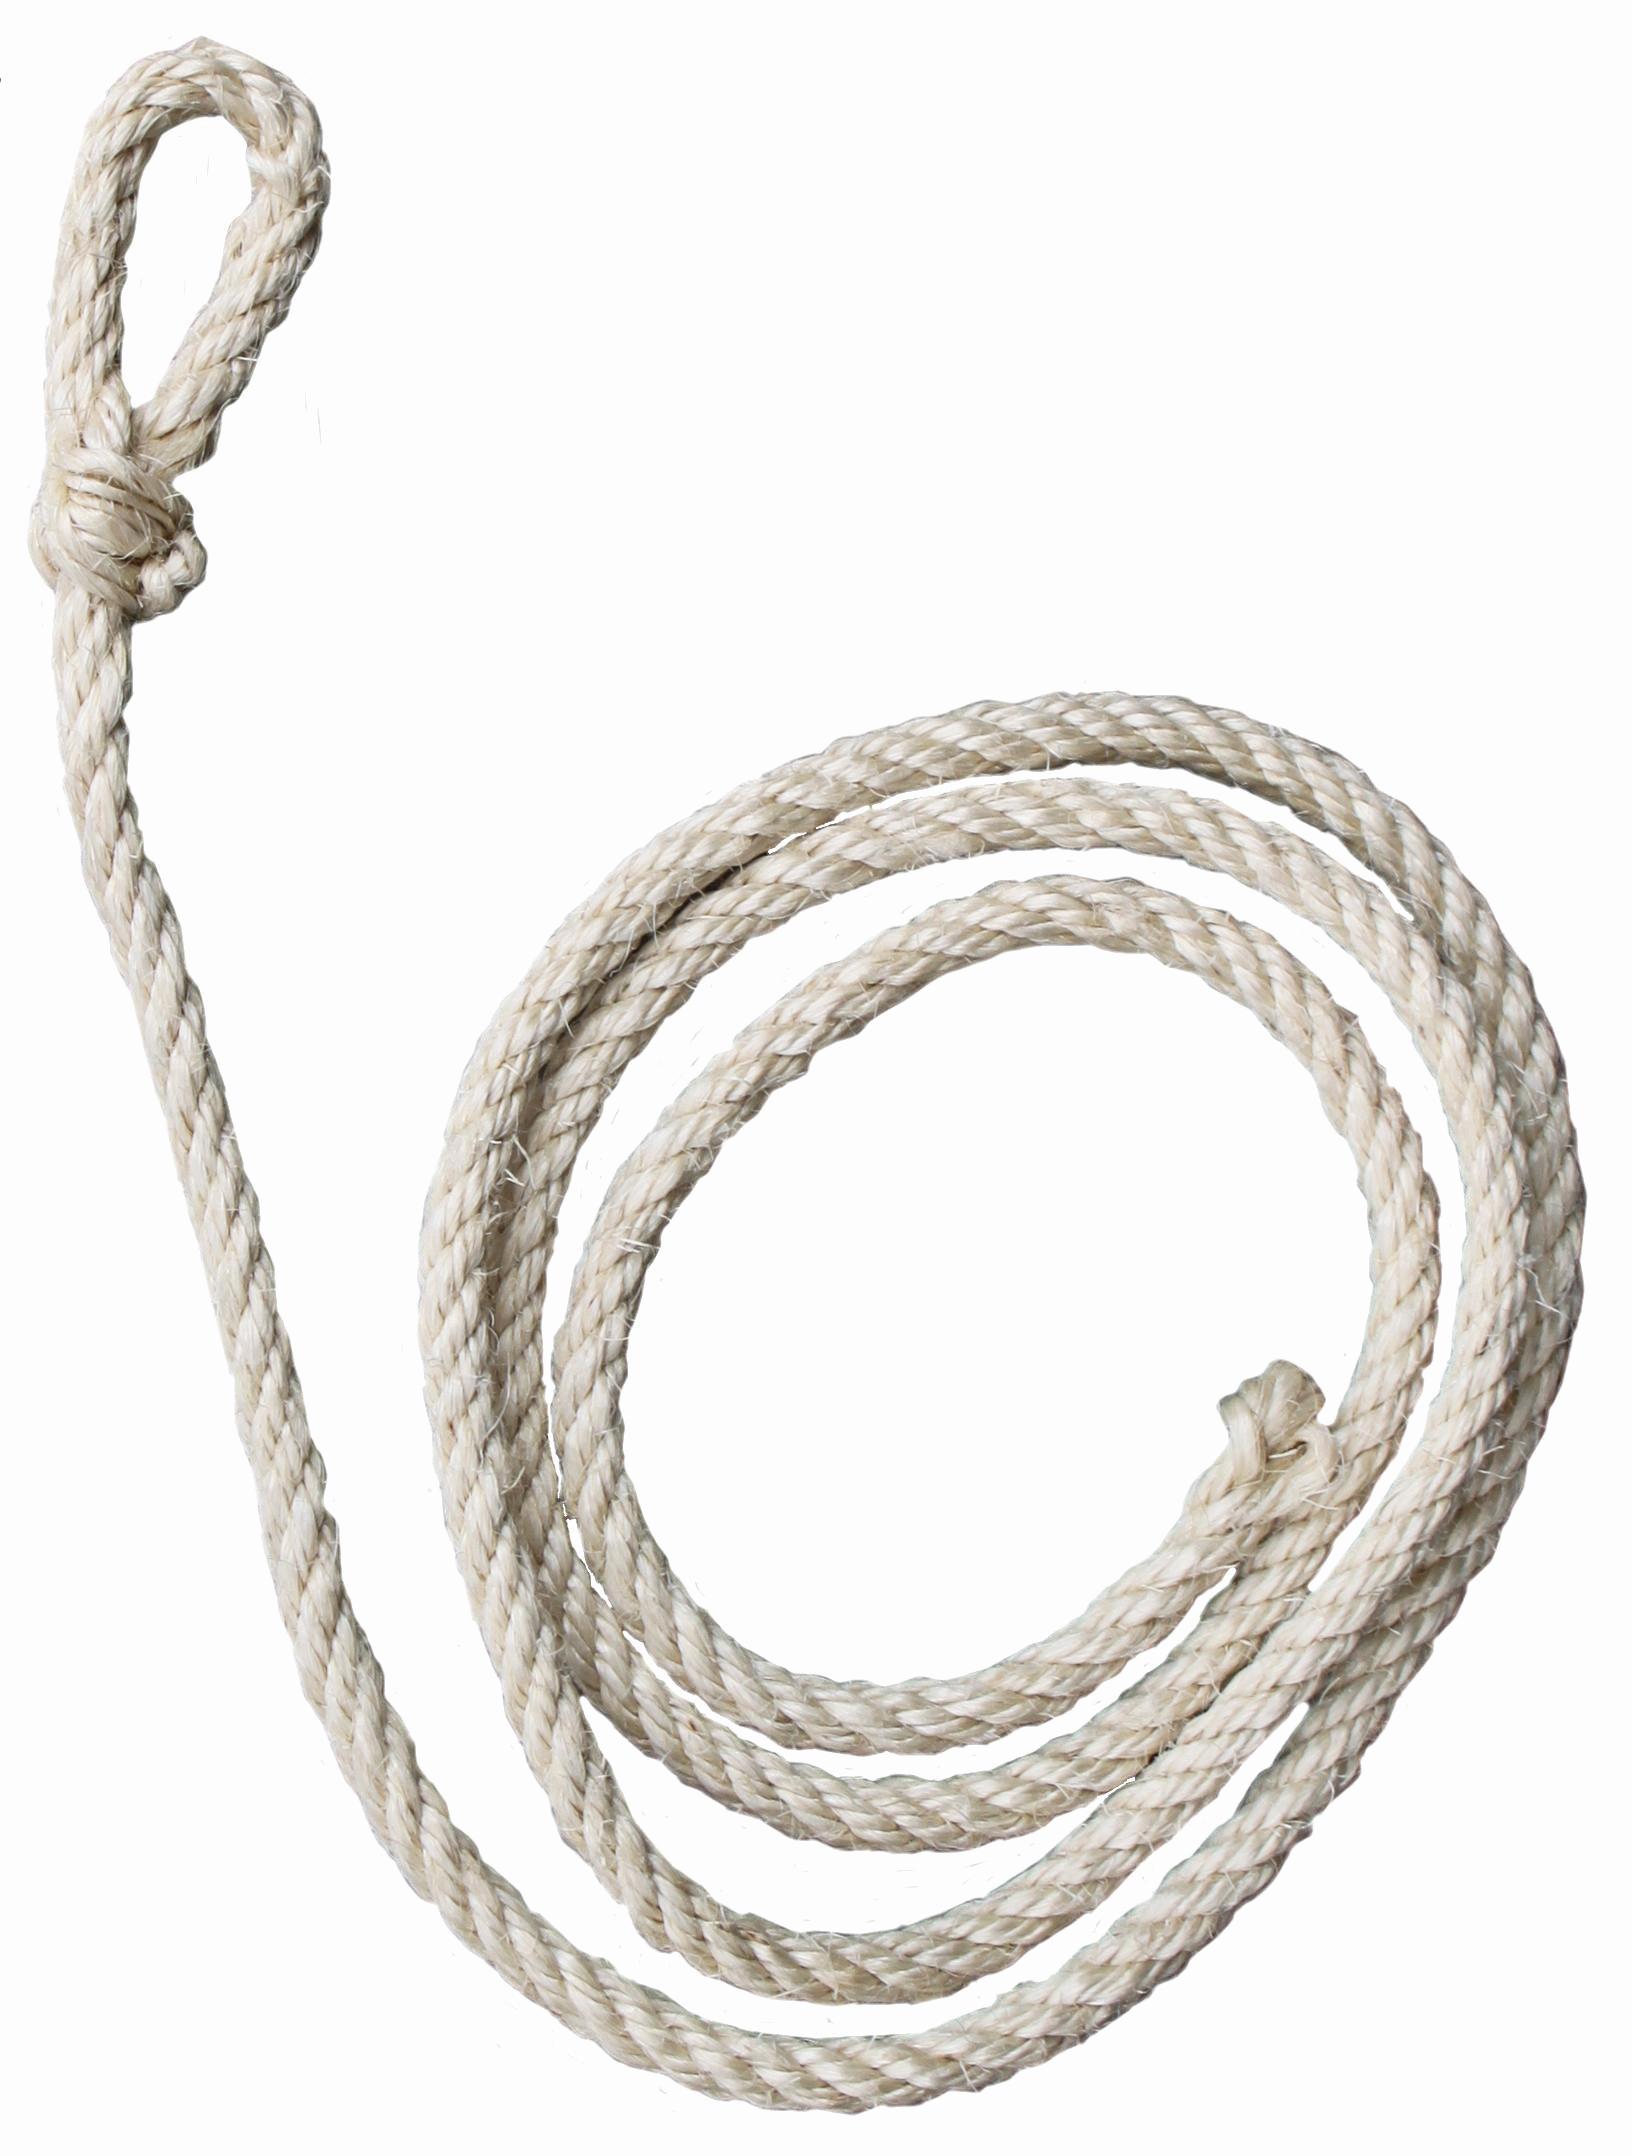 Koetouw wit sisal standaard